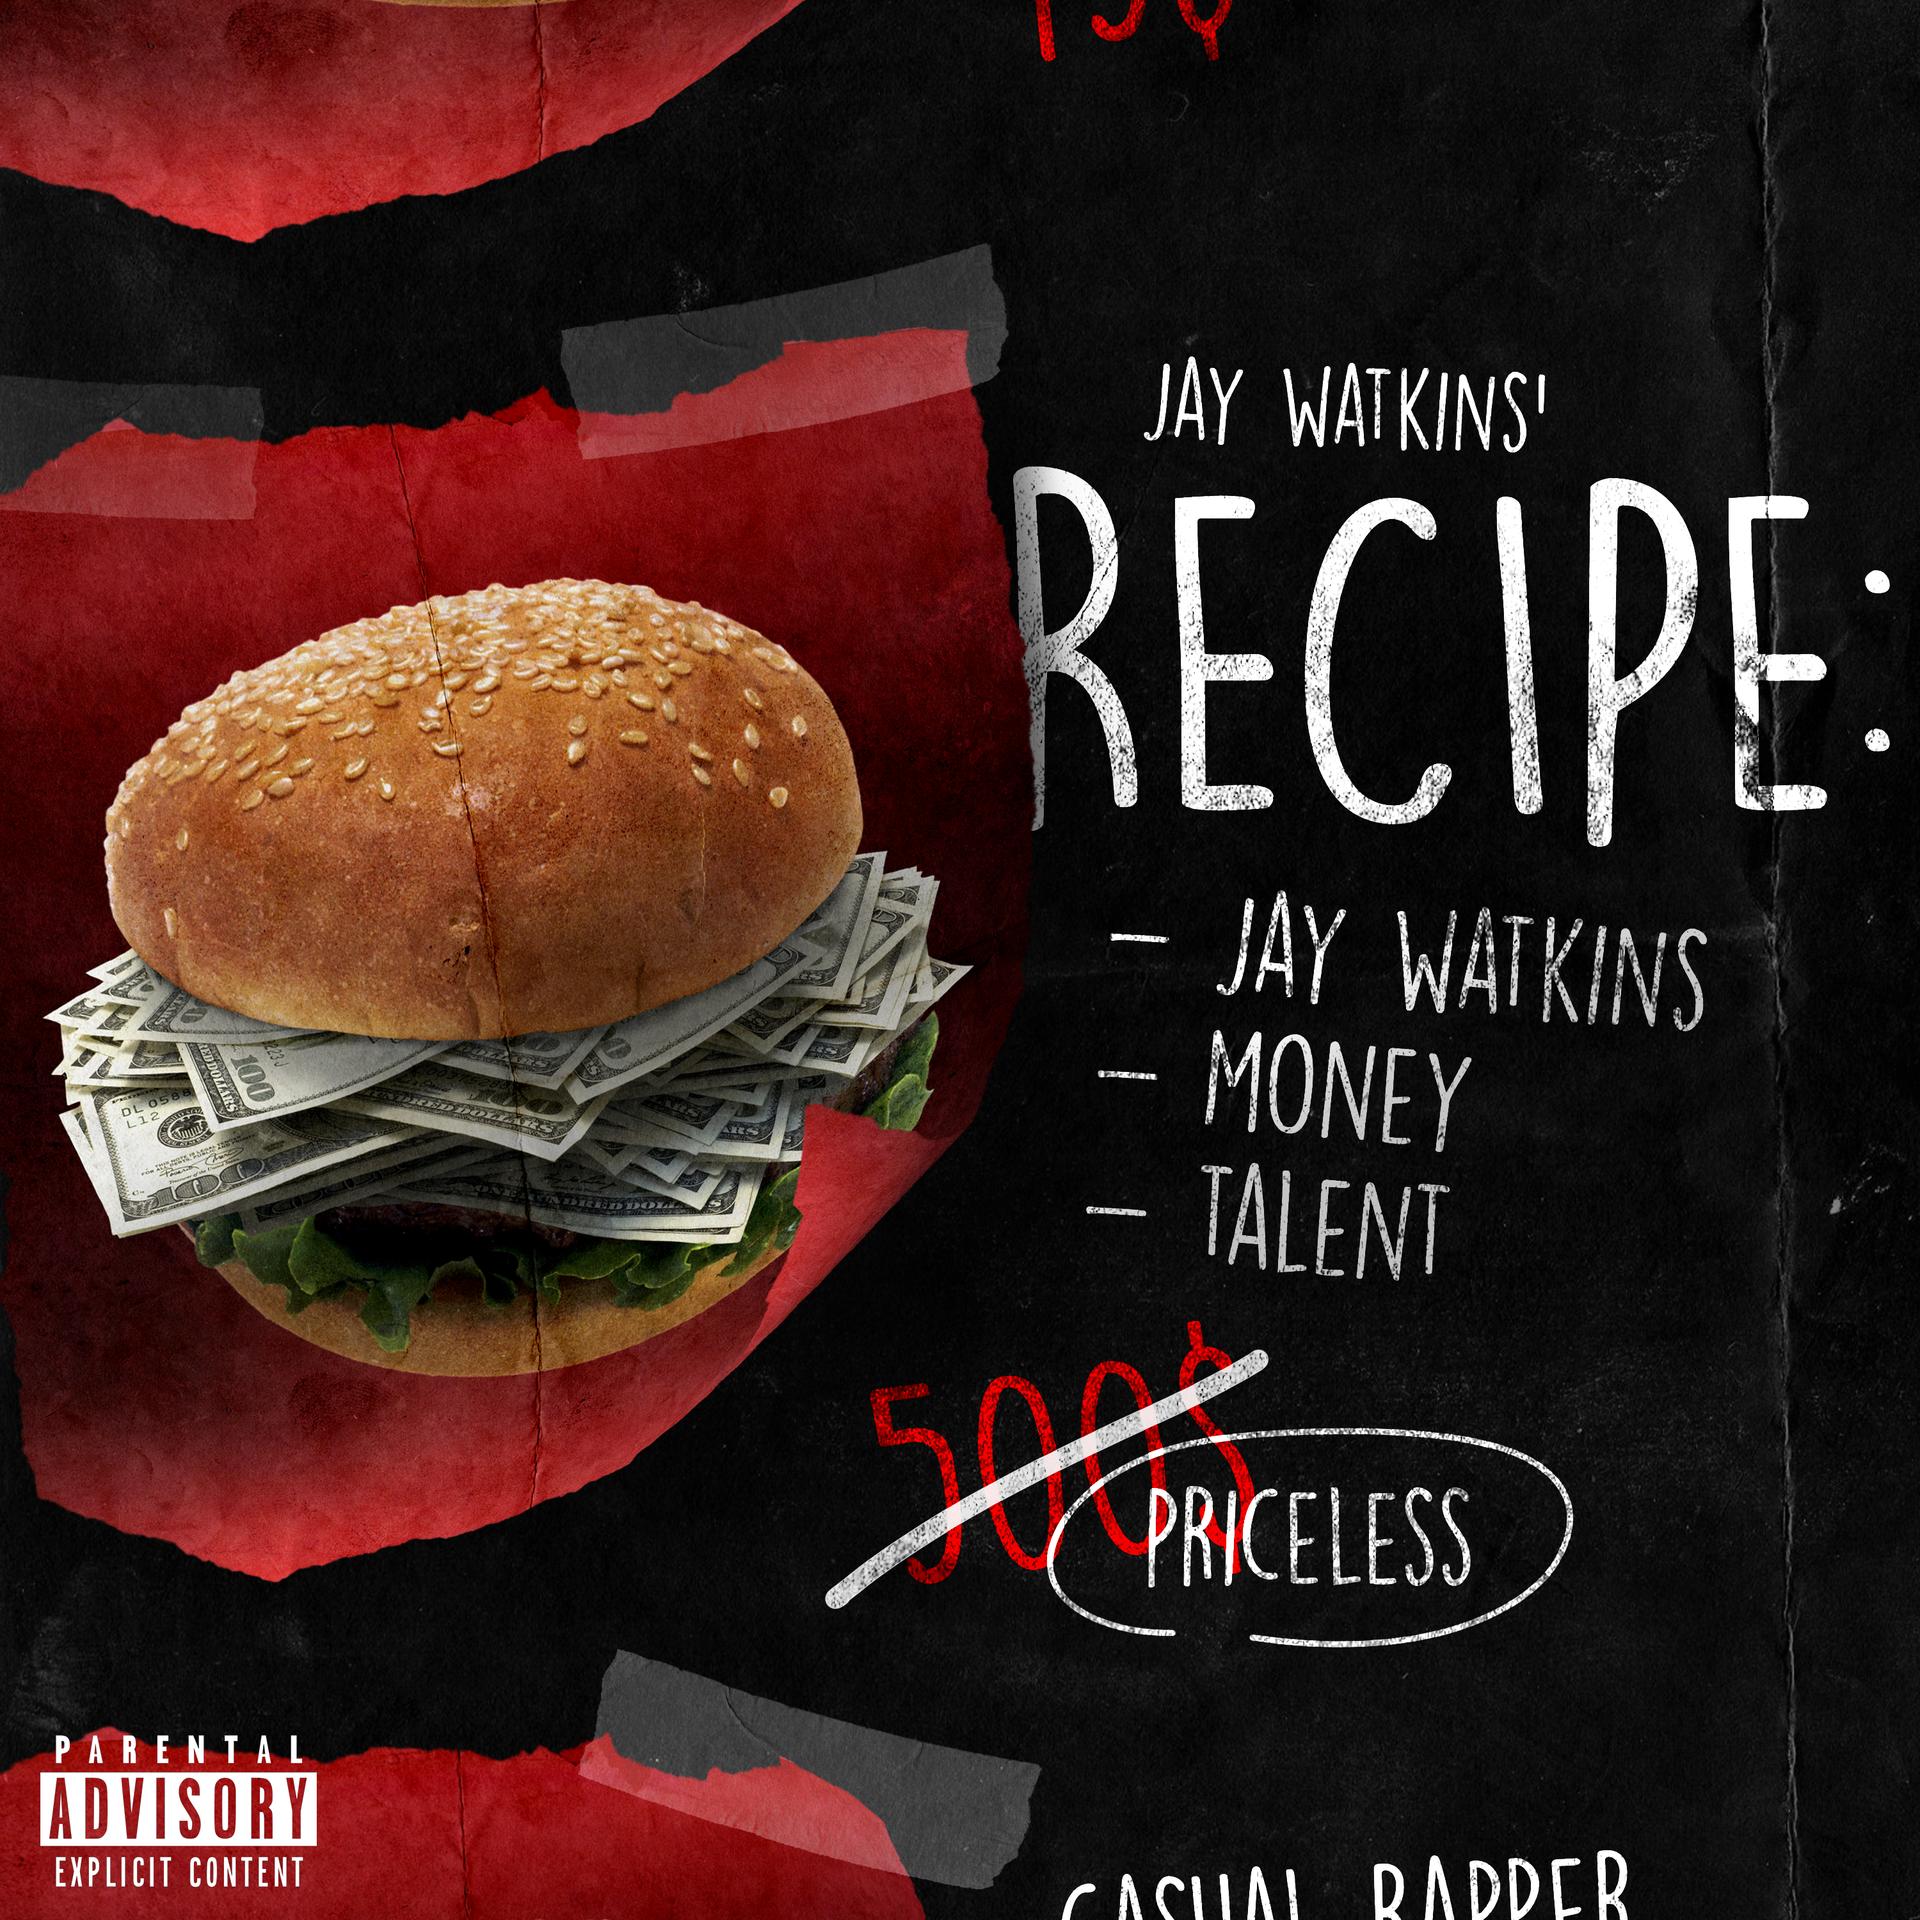 Recipe - Jay Watkins